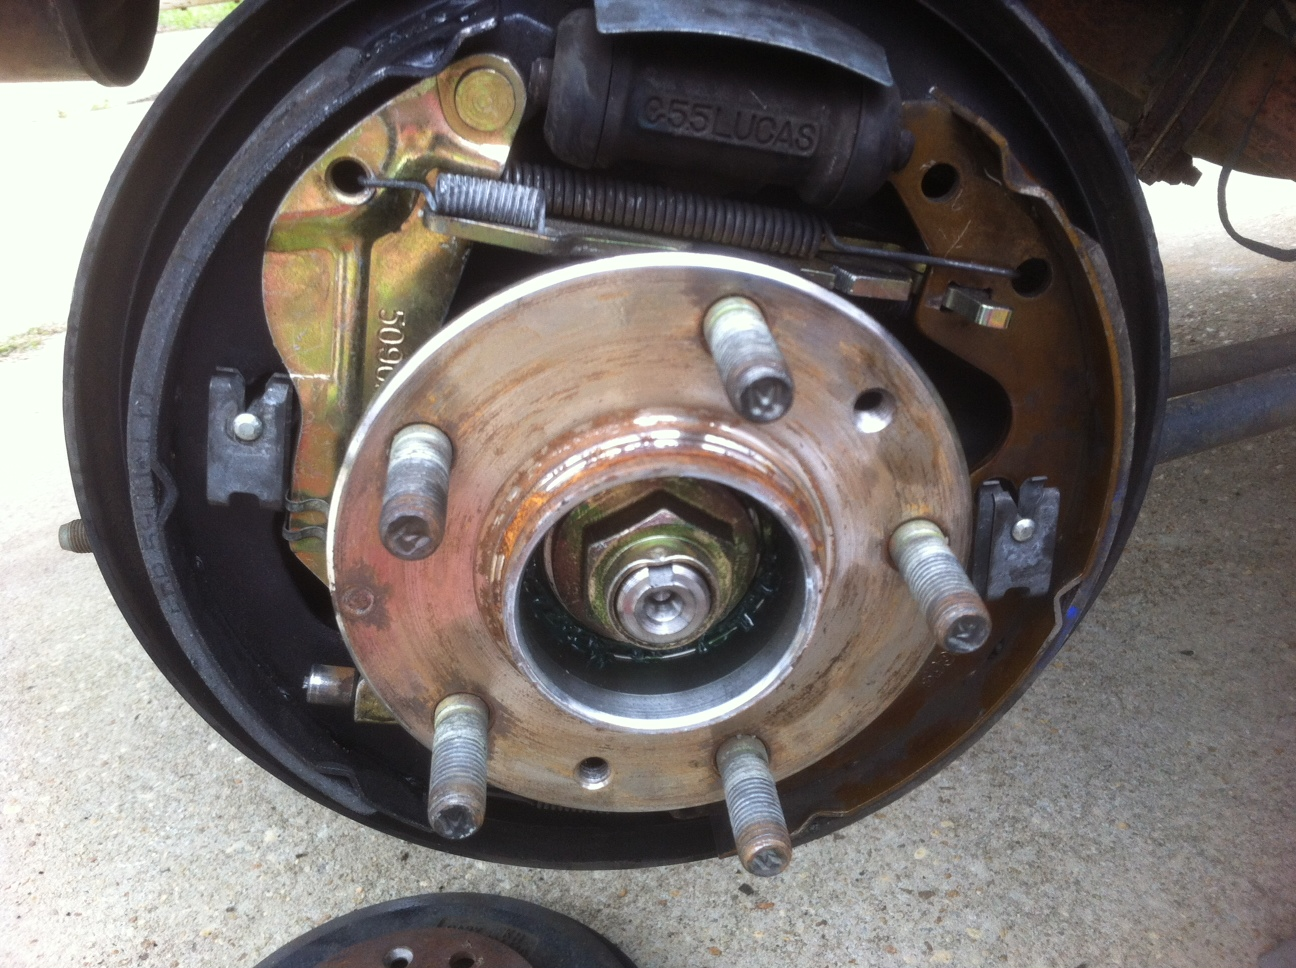 Mazda Protege Brake Diagram Html Auto Engine And Parts